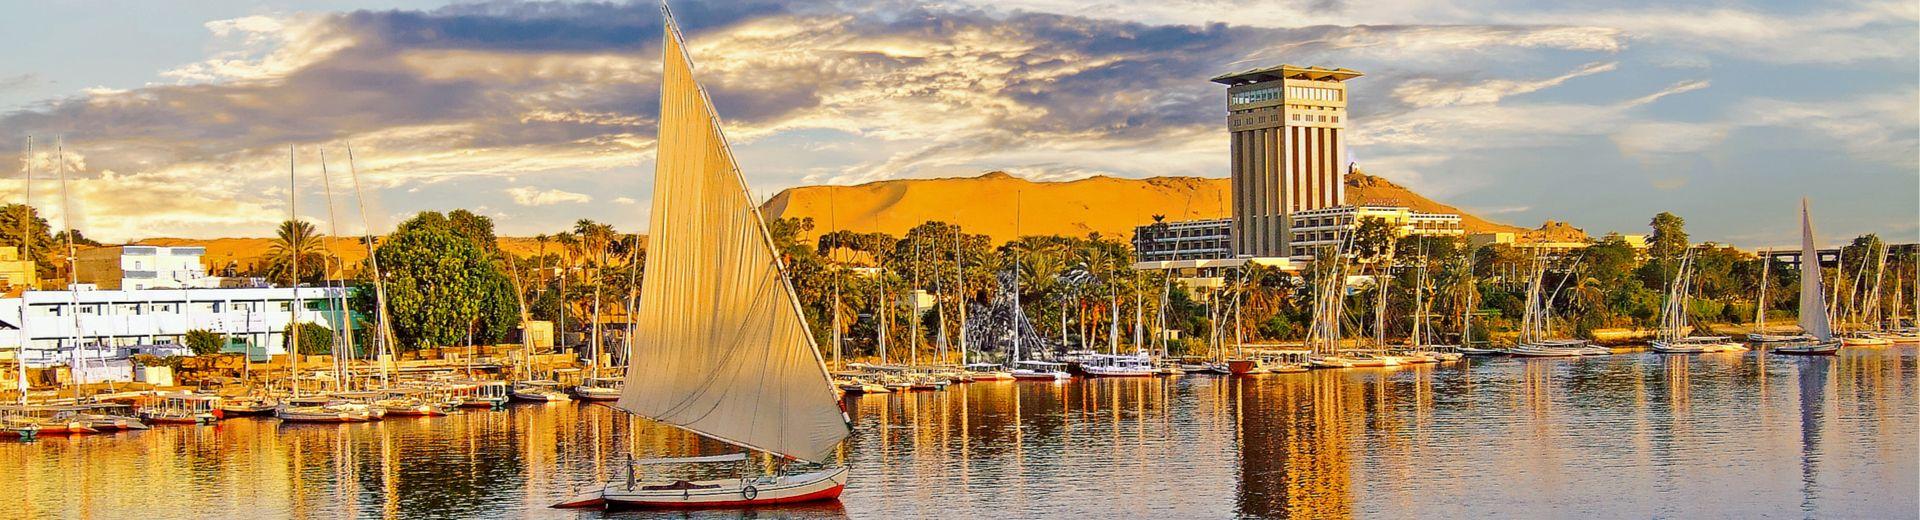 Nilkreuzfahrt ab Luxor